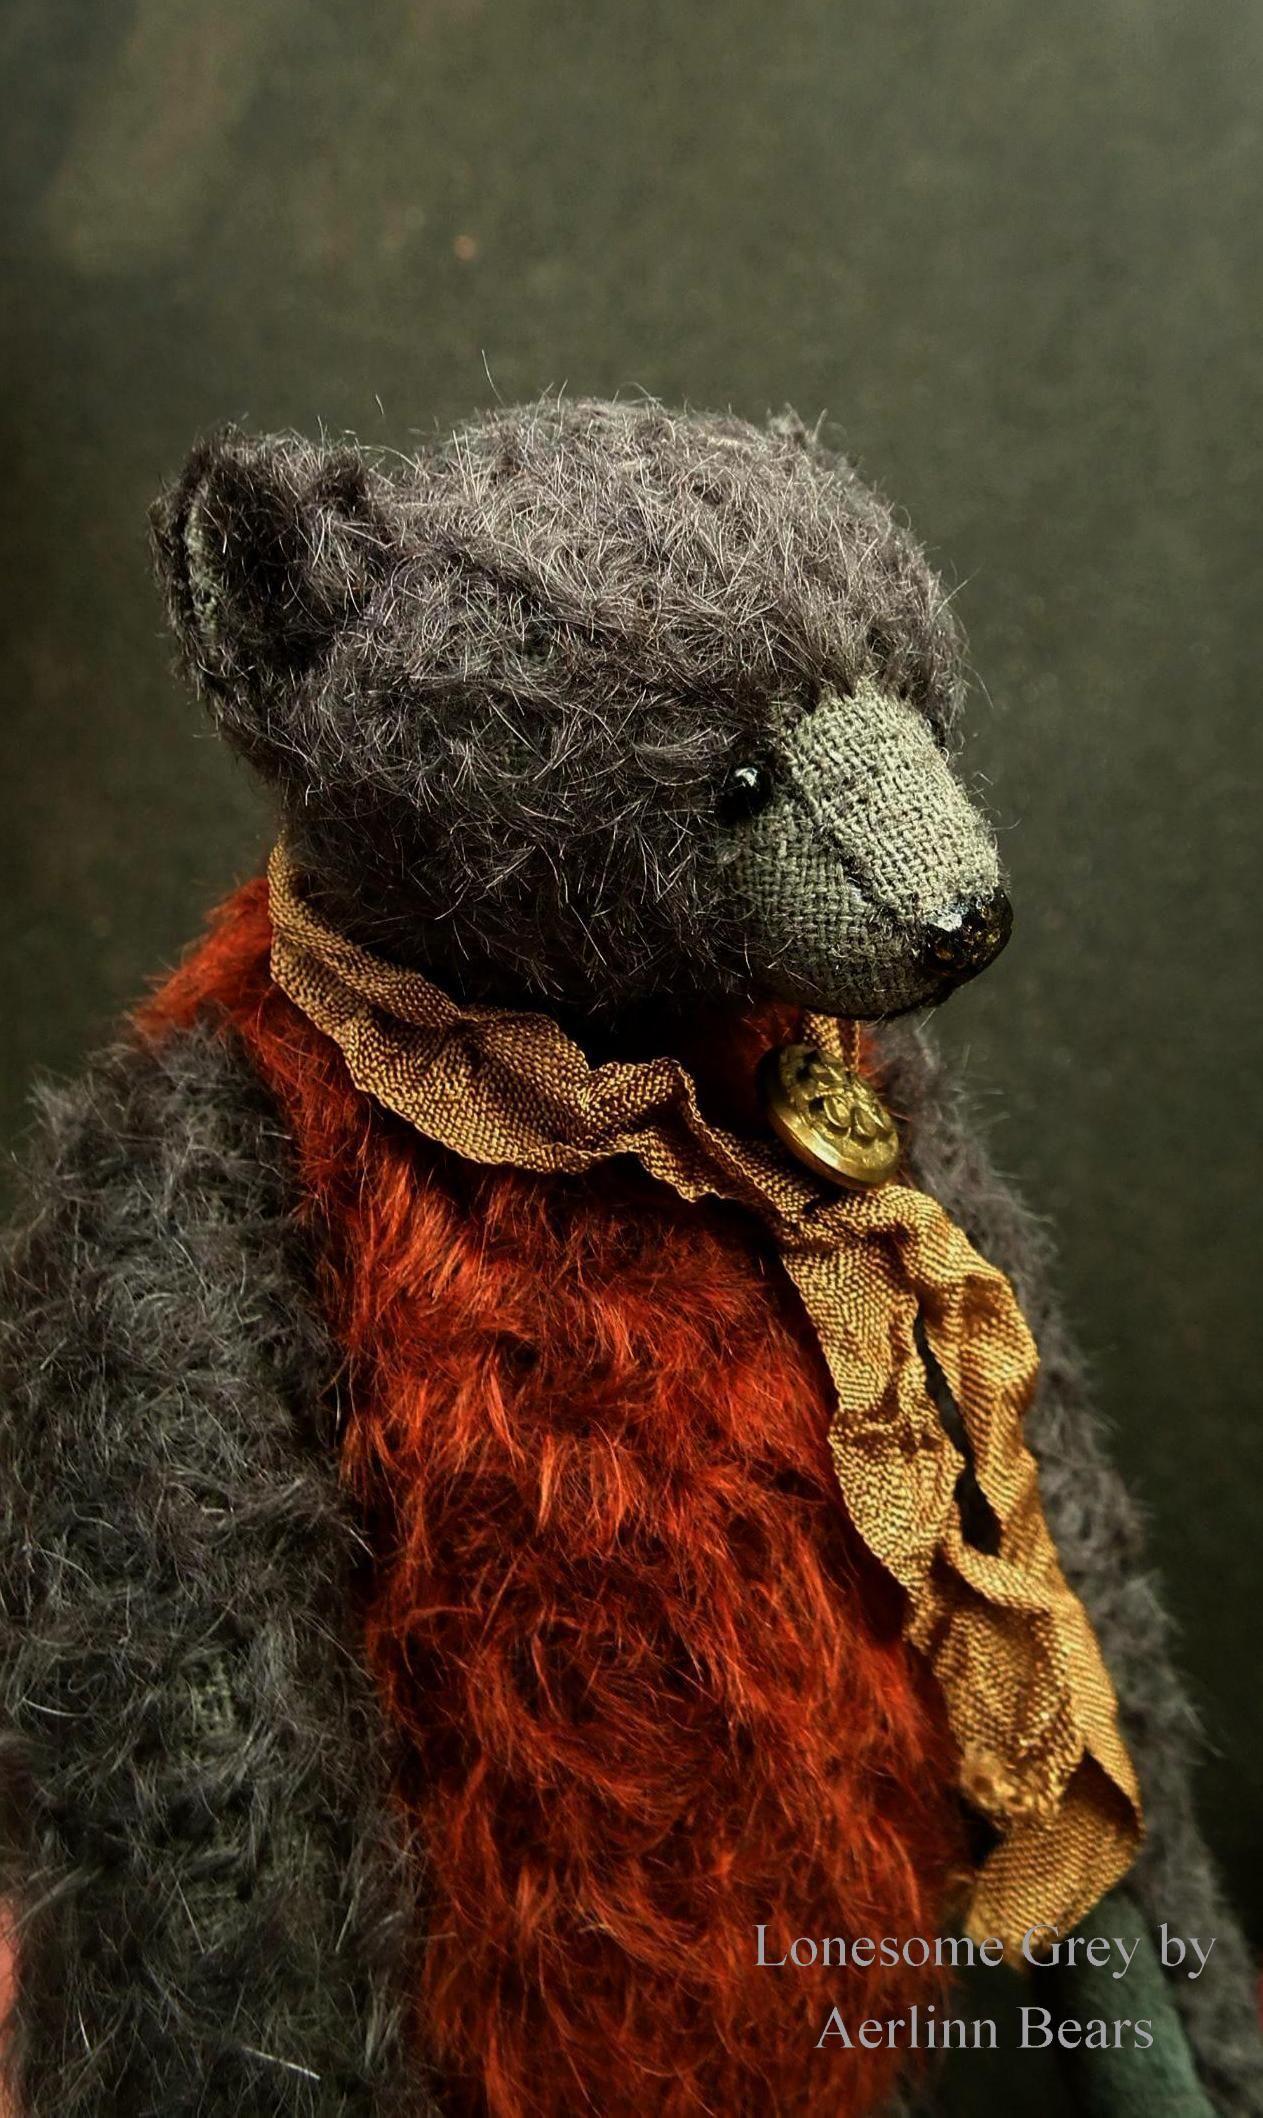 Lonesome Grey, OOAK Mohair Artist Teddy Bear from Aerlinn Bears